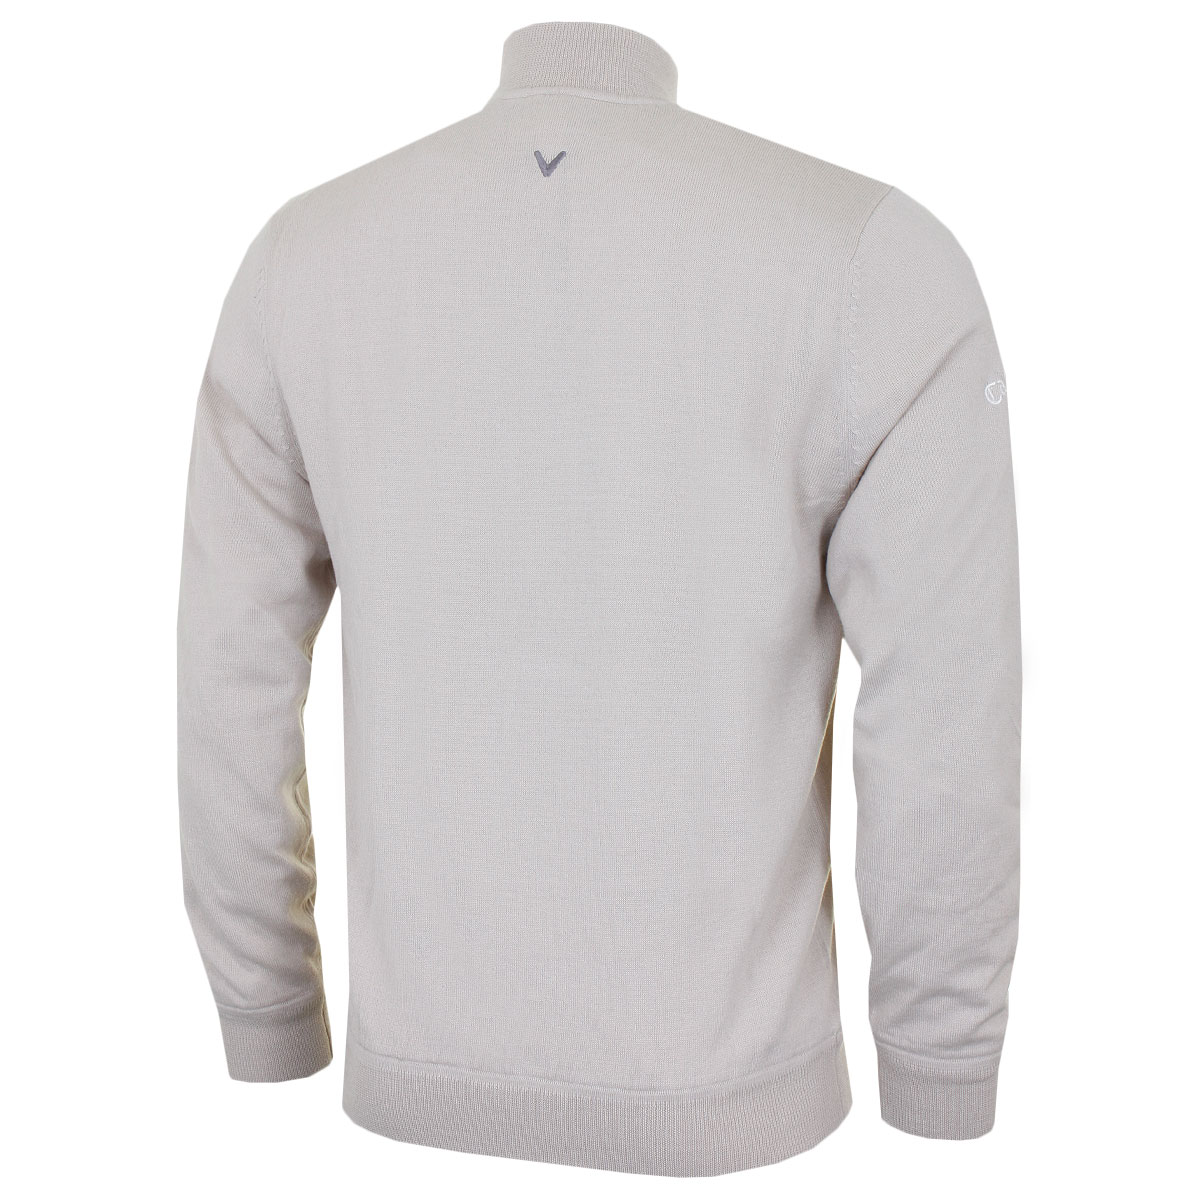 Callaway-Golf-Mens-1-4-Zip-Mock-Merino-Windproof-Sweater-Pullover-43-OFF-RRP thumbnail 23